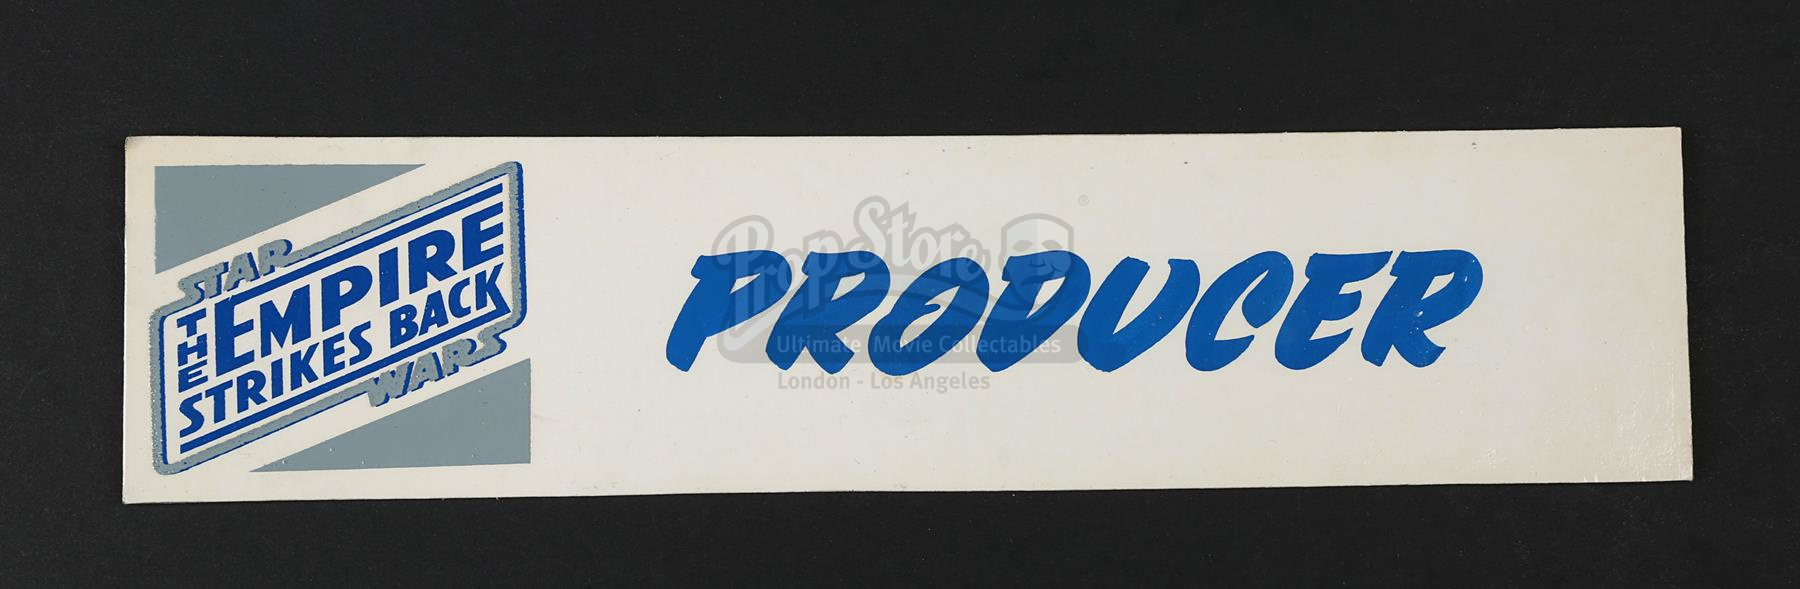 kurtz-gary-producer-1